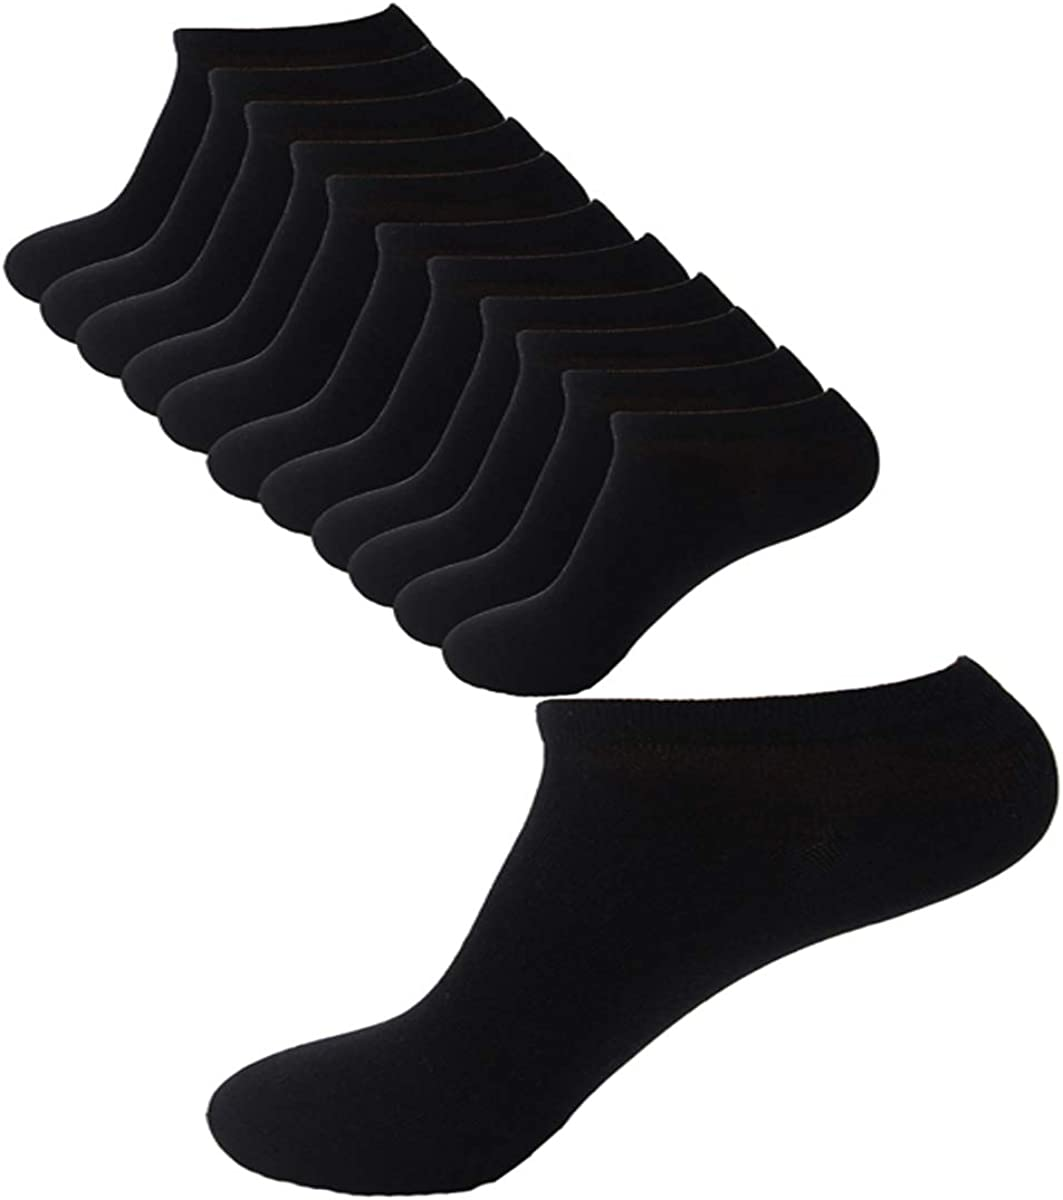 Garcia Pescara GP Herren 24 Paar Sport Freizeit Sneaker Socken